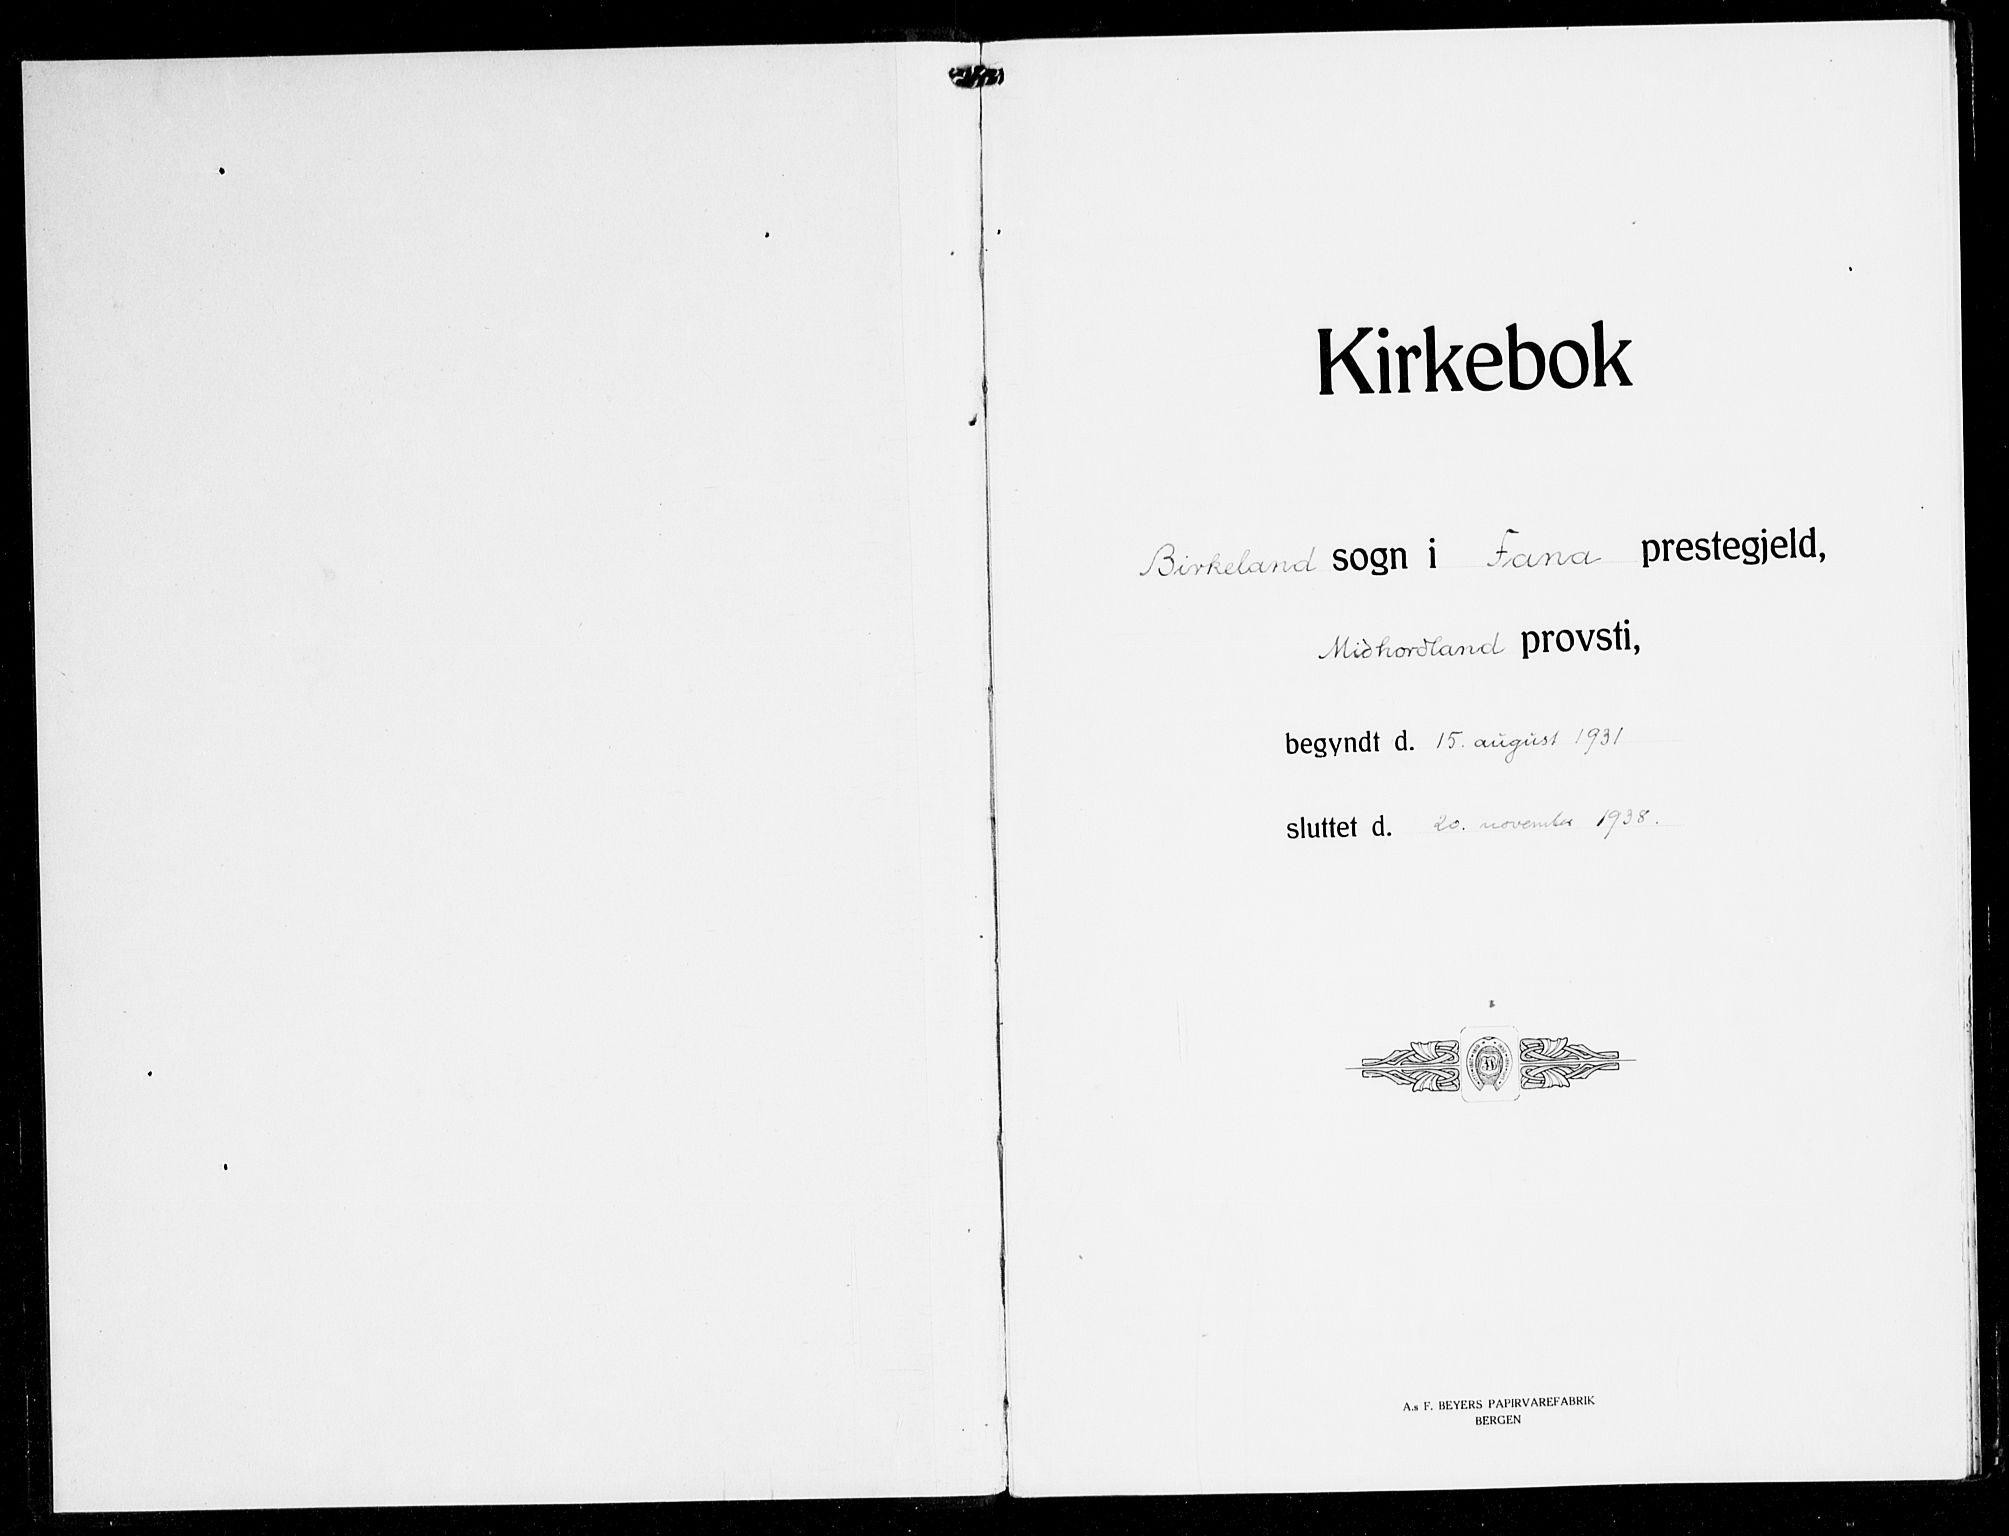 SAB, Fana Sokneprestembete, H/Haa/Haak/L0002: Ministerialbok nr. K 2, 1931-1938